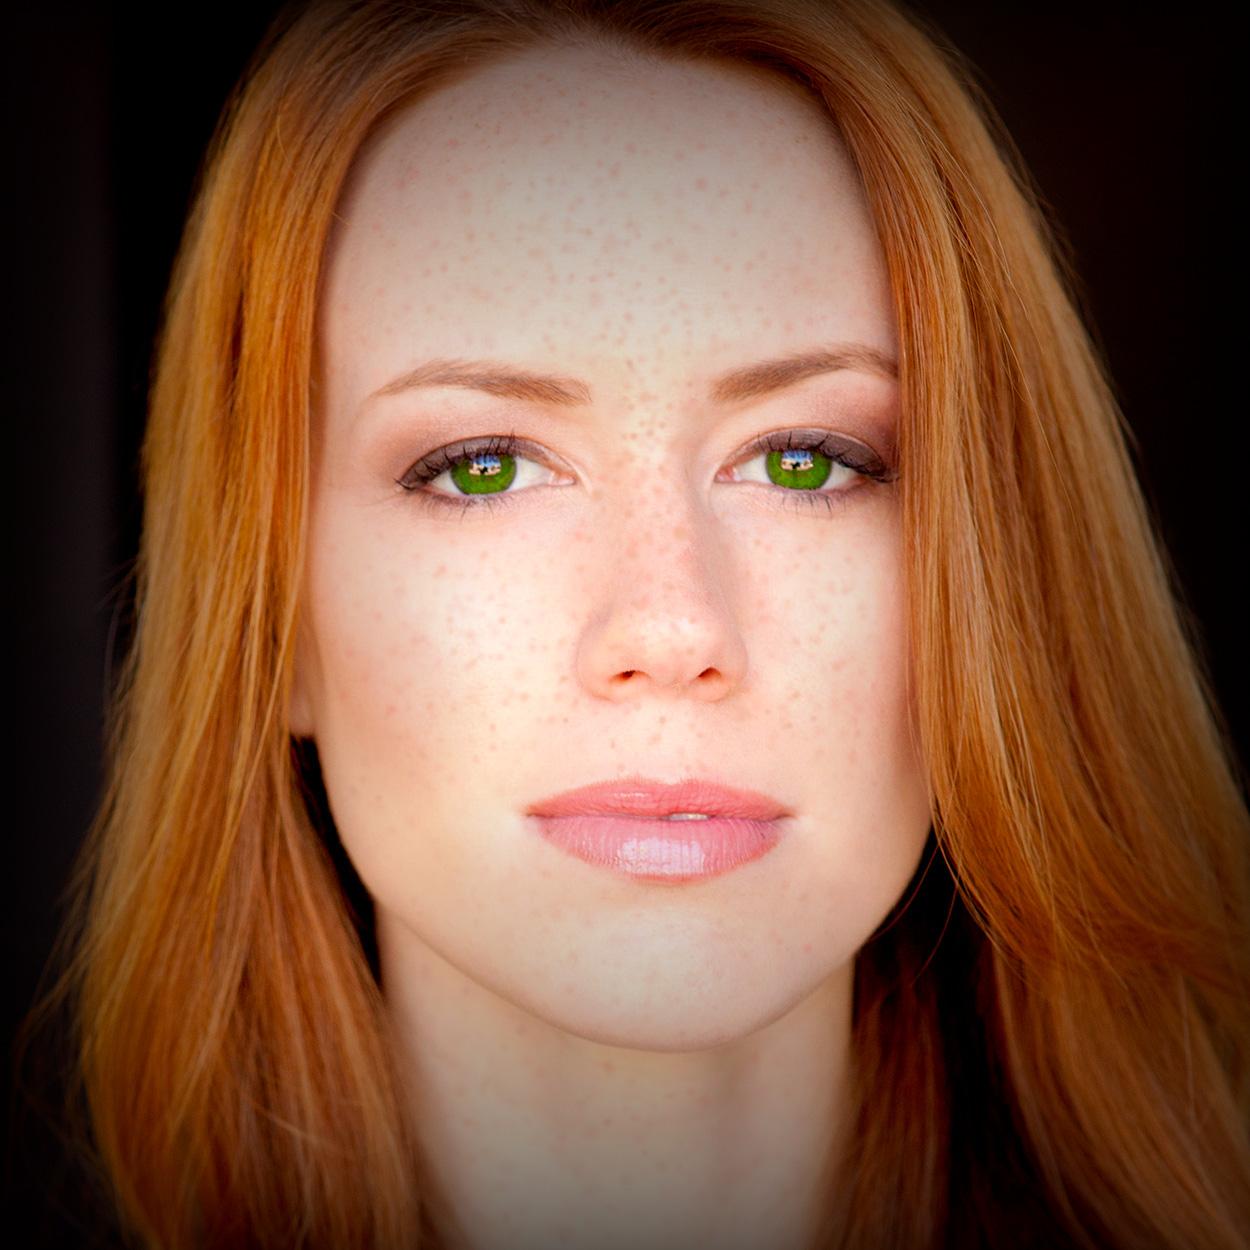 Kathryn Harper